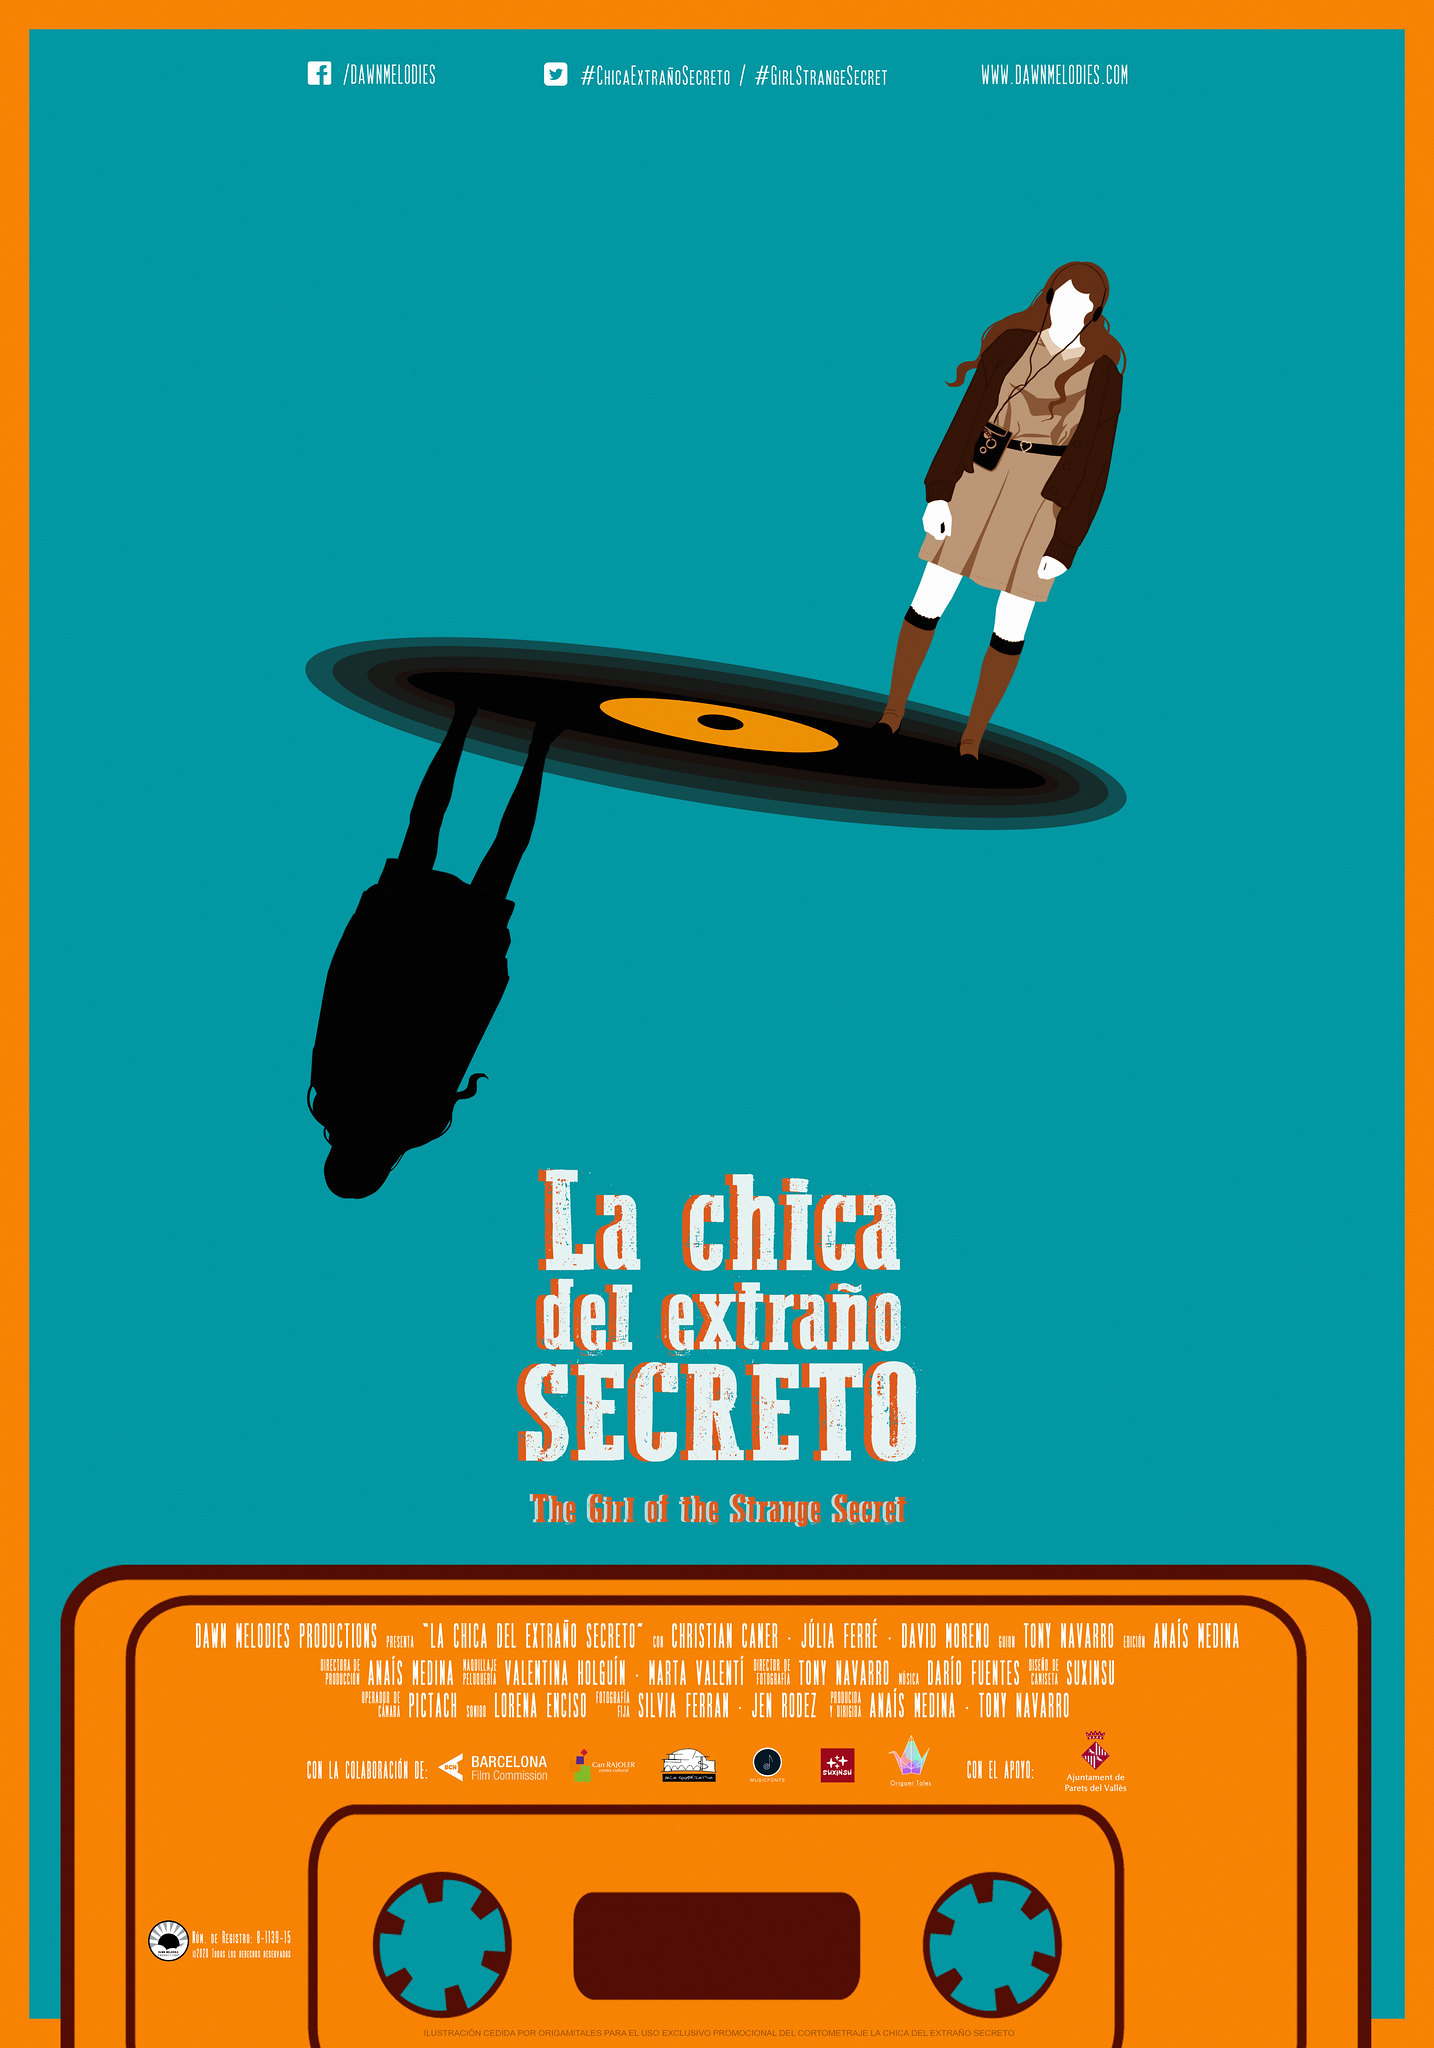 La Chica del Extraño Secreto | The Girl of the Strange Secret - Official Poster